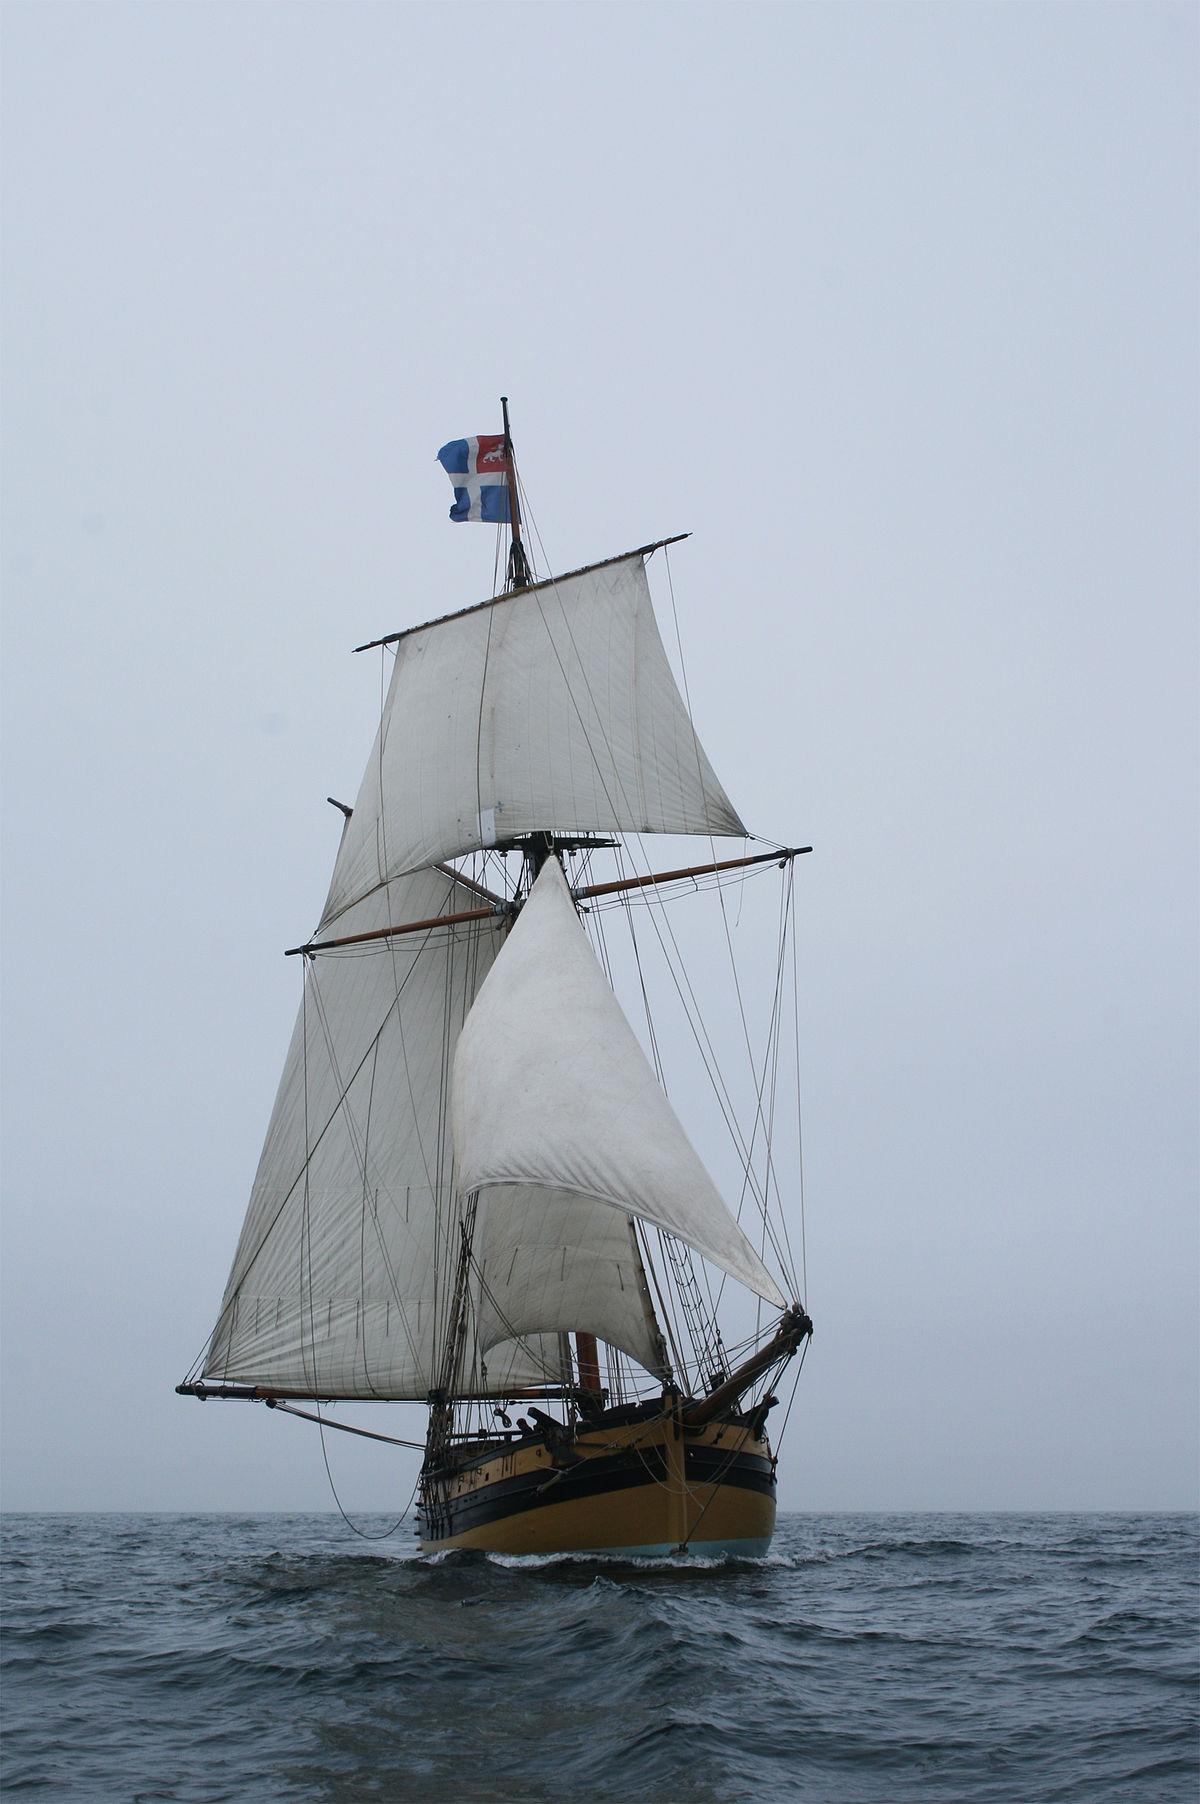 Corsaire wikip dia - Voile bateau pirate ...